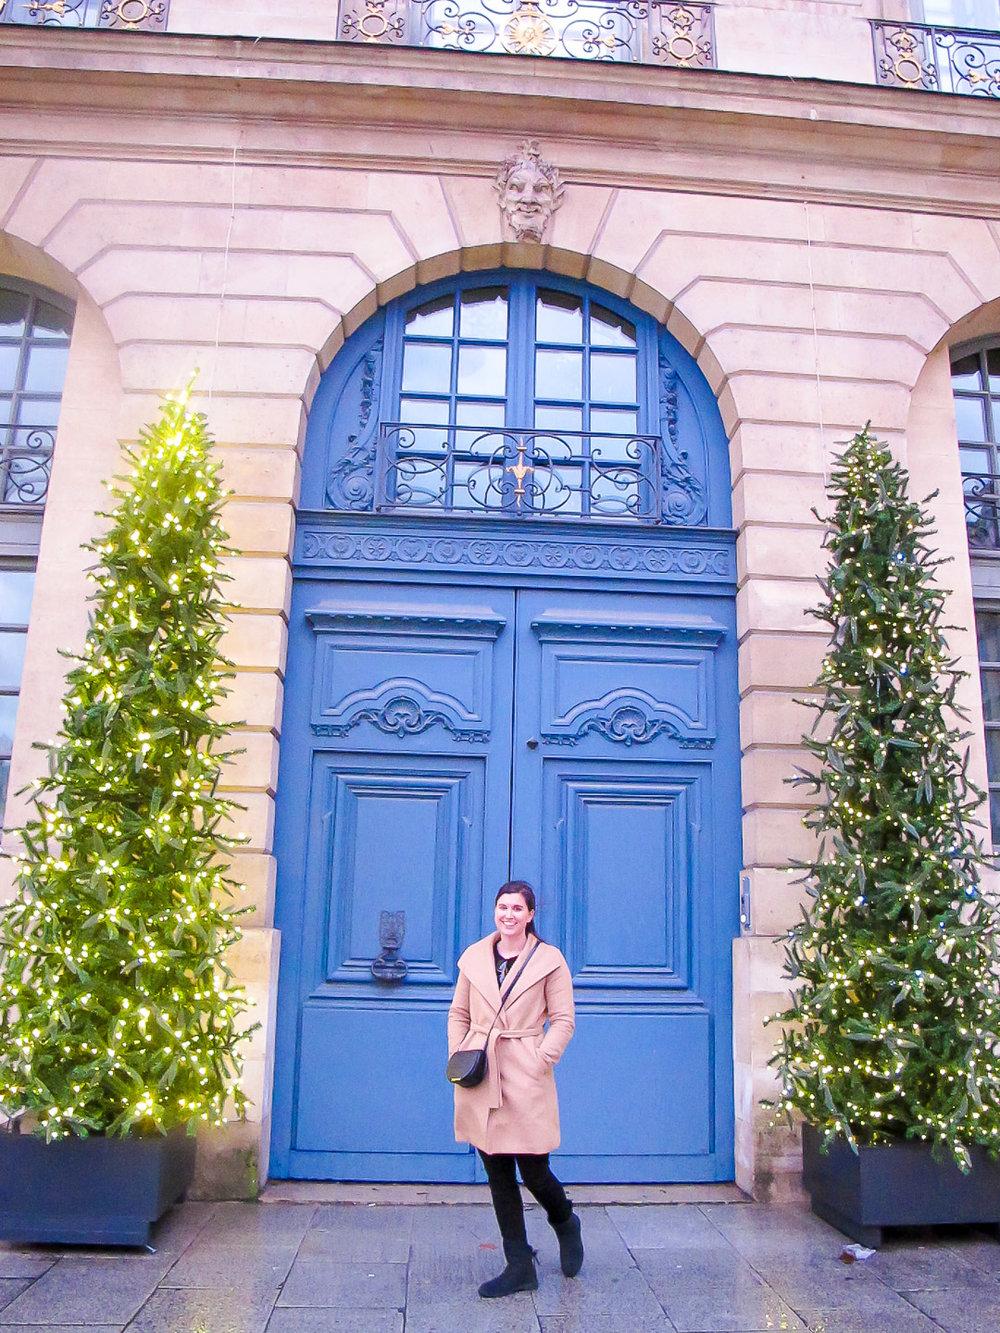 Walking around Place Vendome